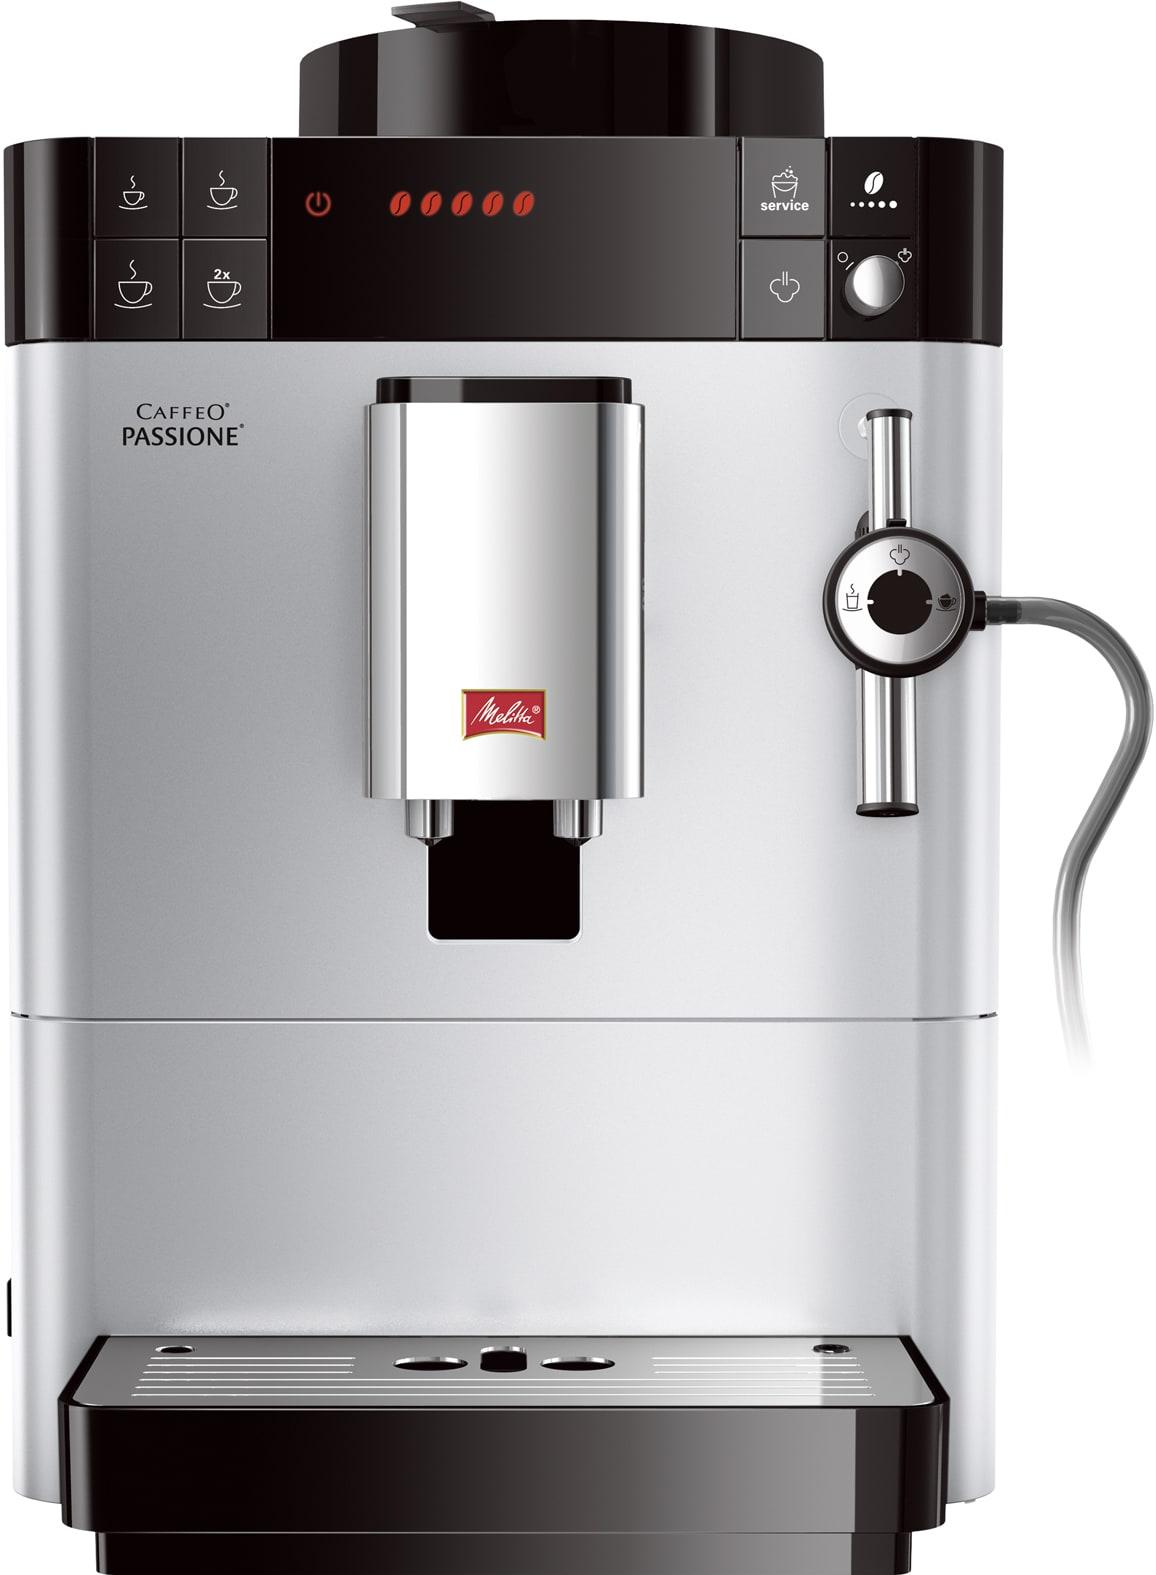 Melitta Caffeo Passione F53/0-101 Kaffeevollautomat 1,2l Stahl-Kegelmahlwerk für 444,00 Euro